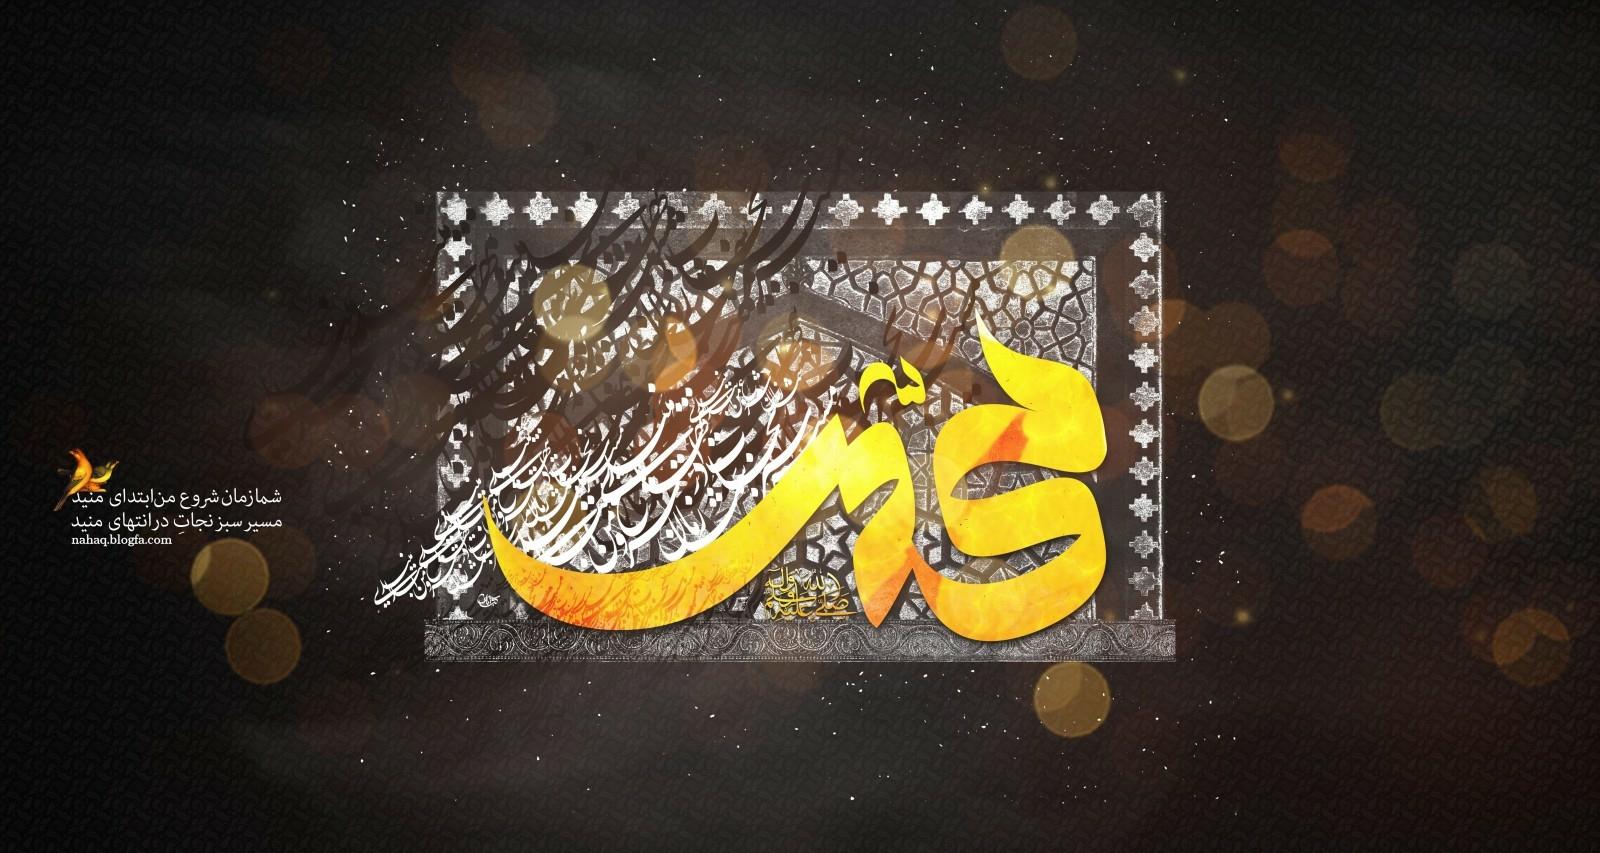 h-mohammad1